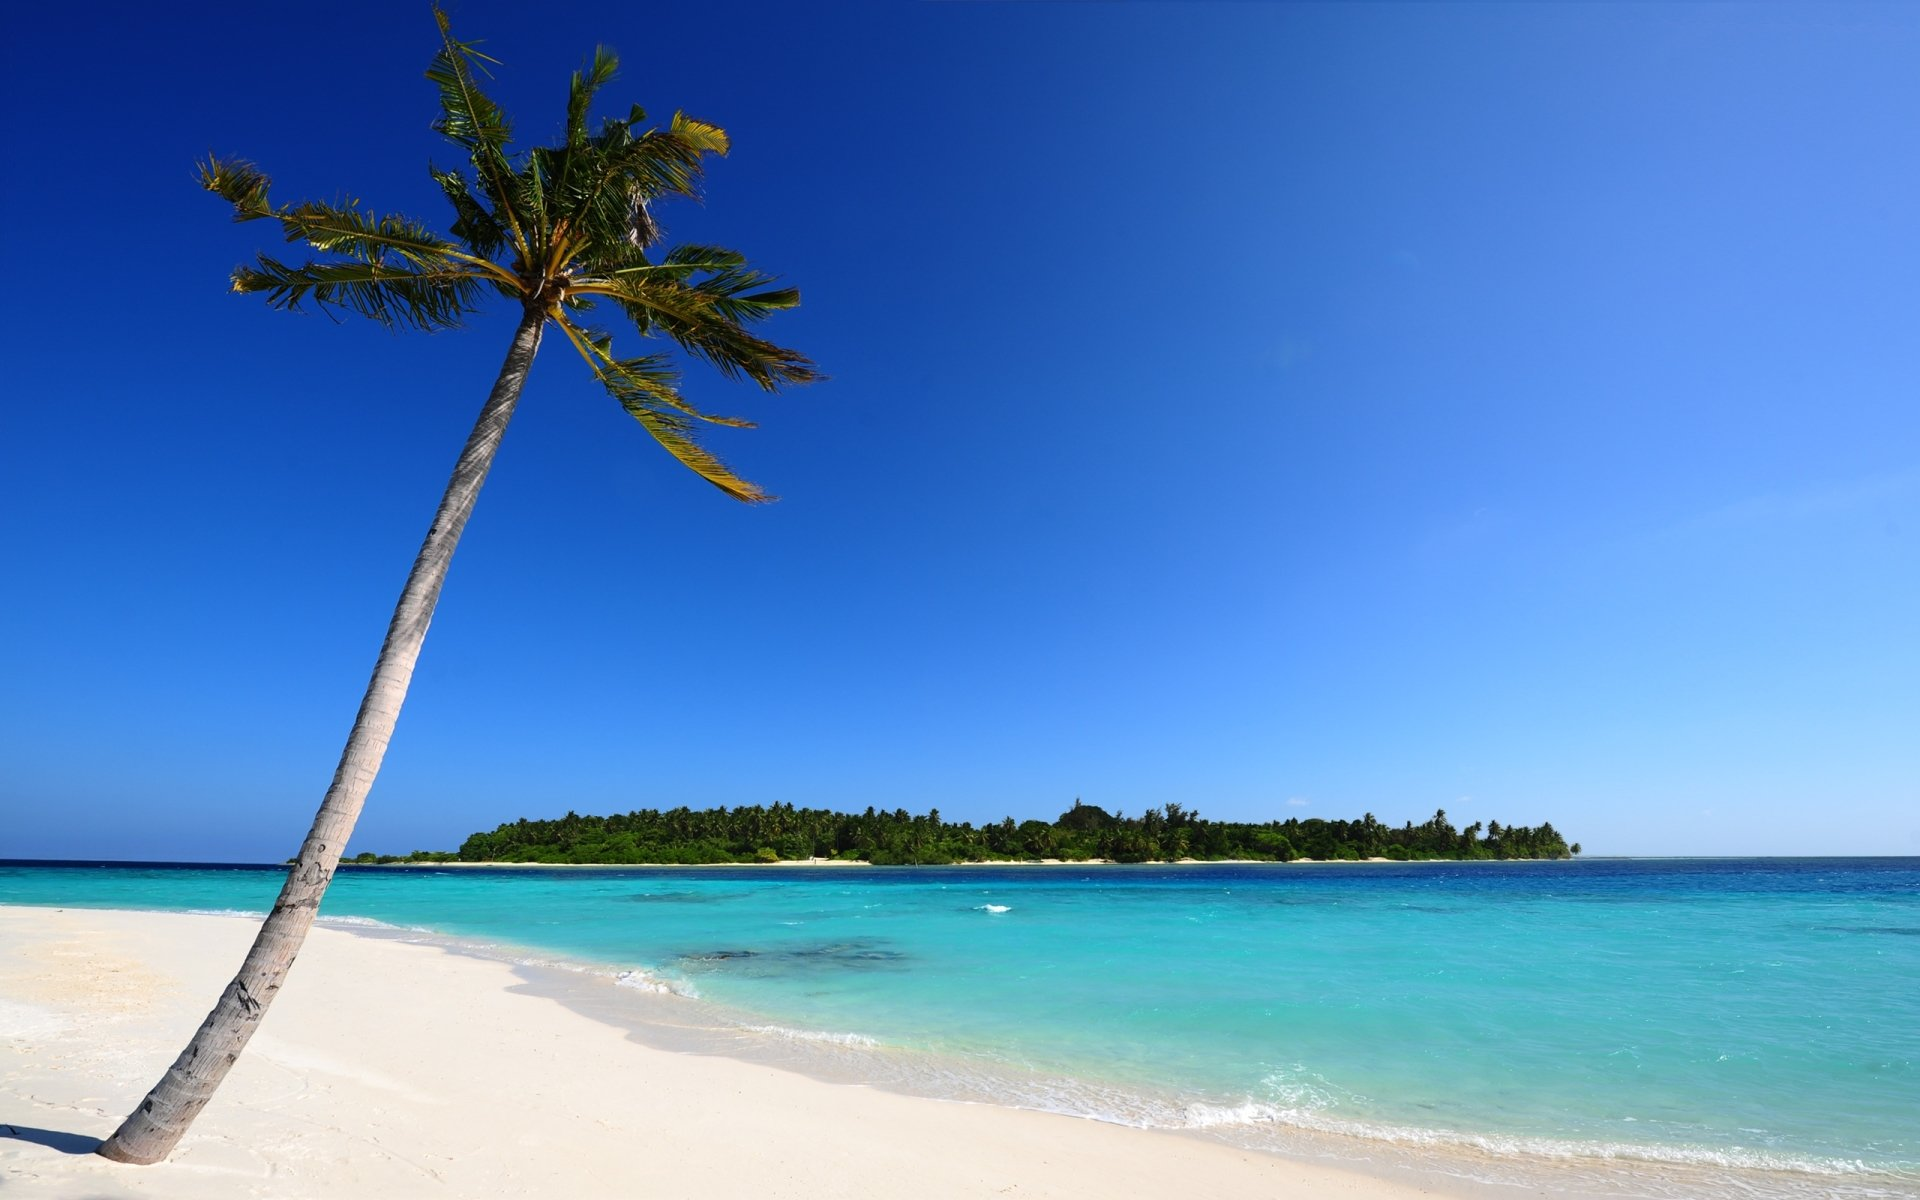 Earth - Beach  Sky Ocean Blue Maldives Island Palm Tree Tropical Sand Wallpaper